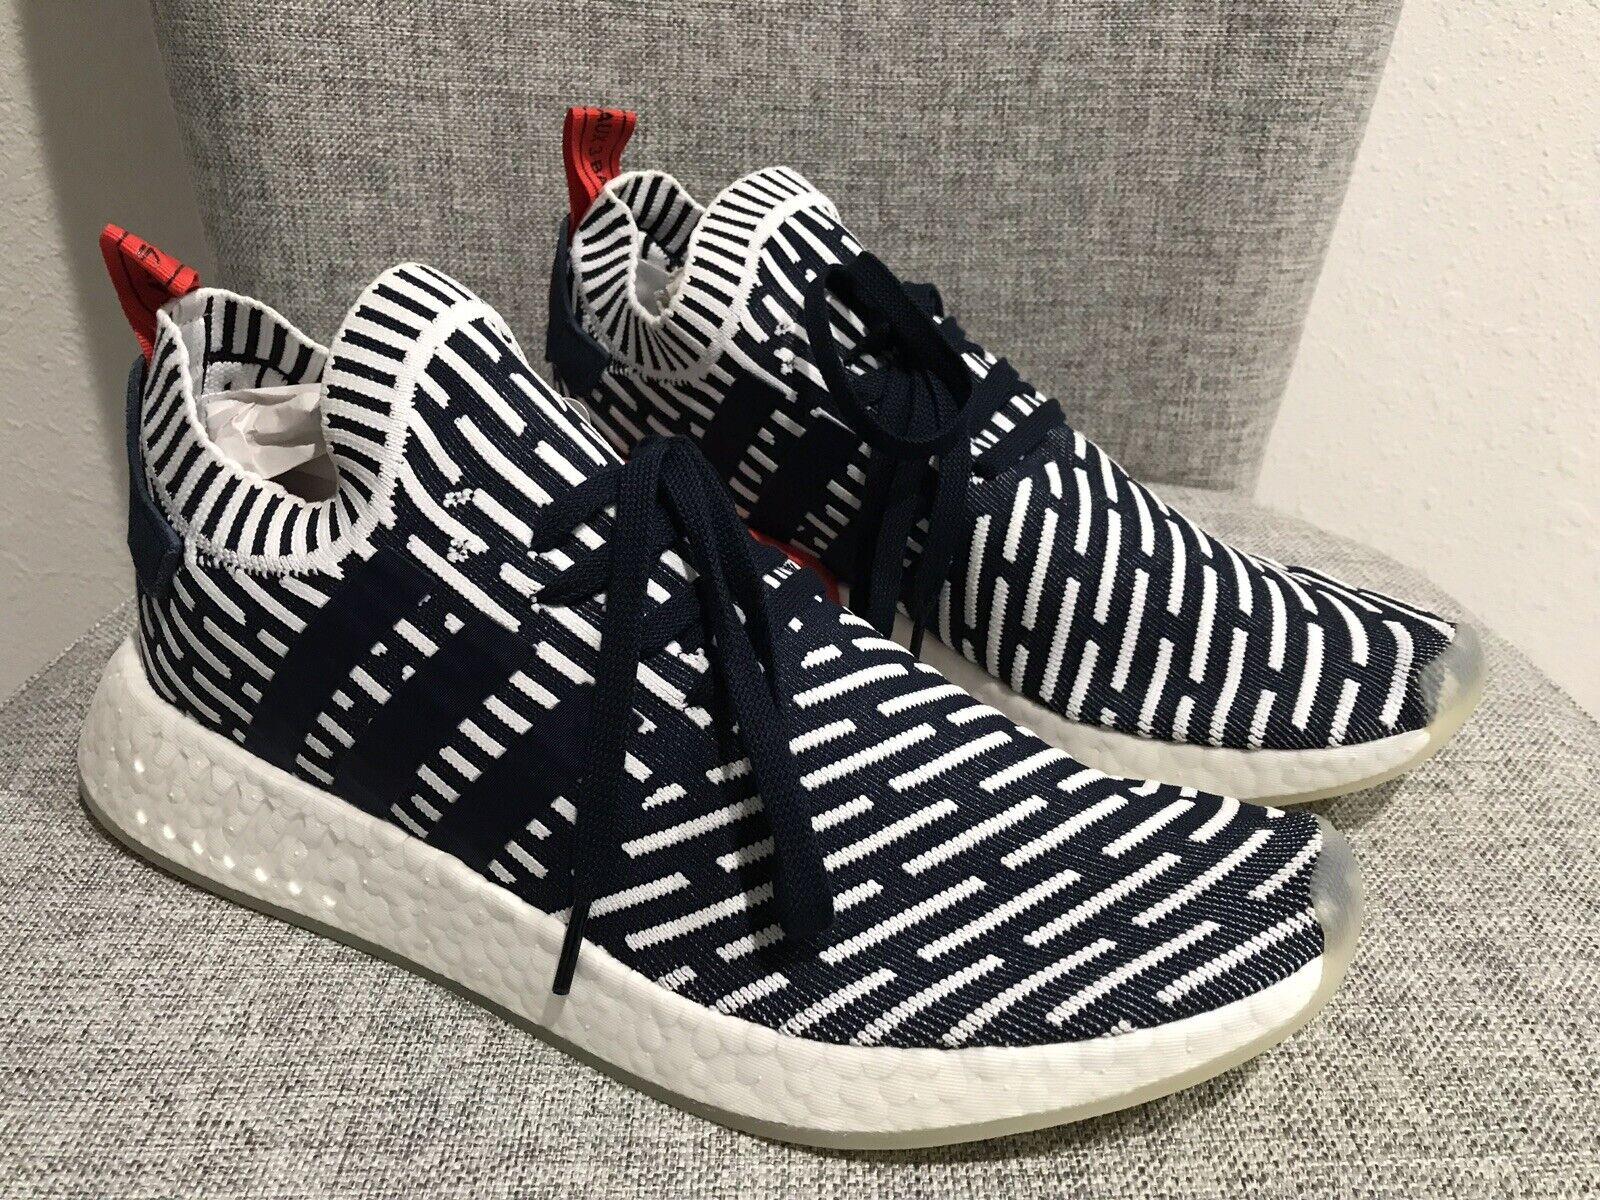 Adidas Men's NMD R2 Primeknit shoes Roni PK bluee White BB2909 New Size 12.5